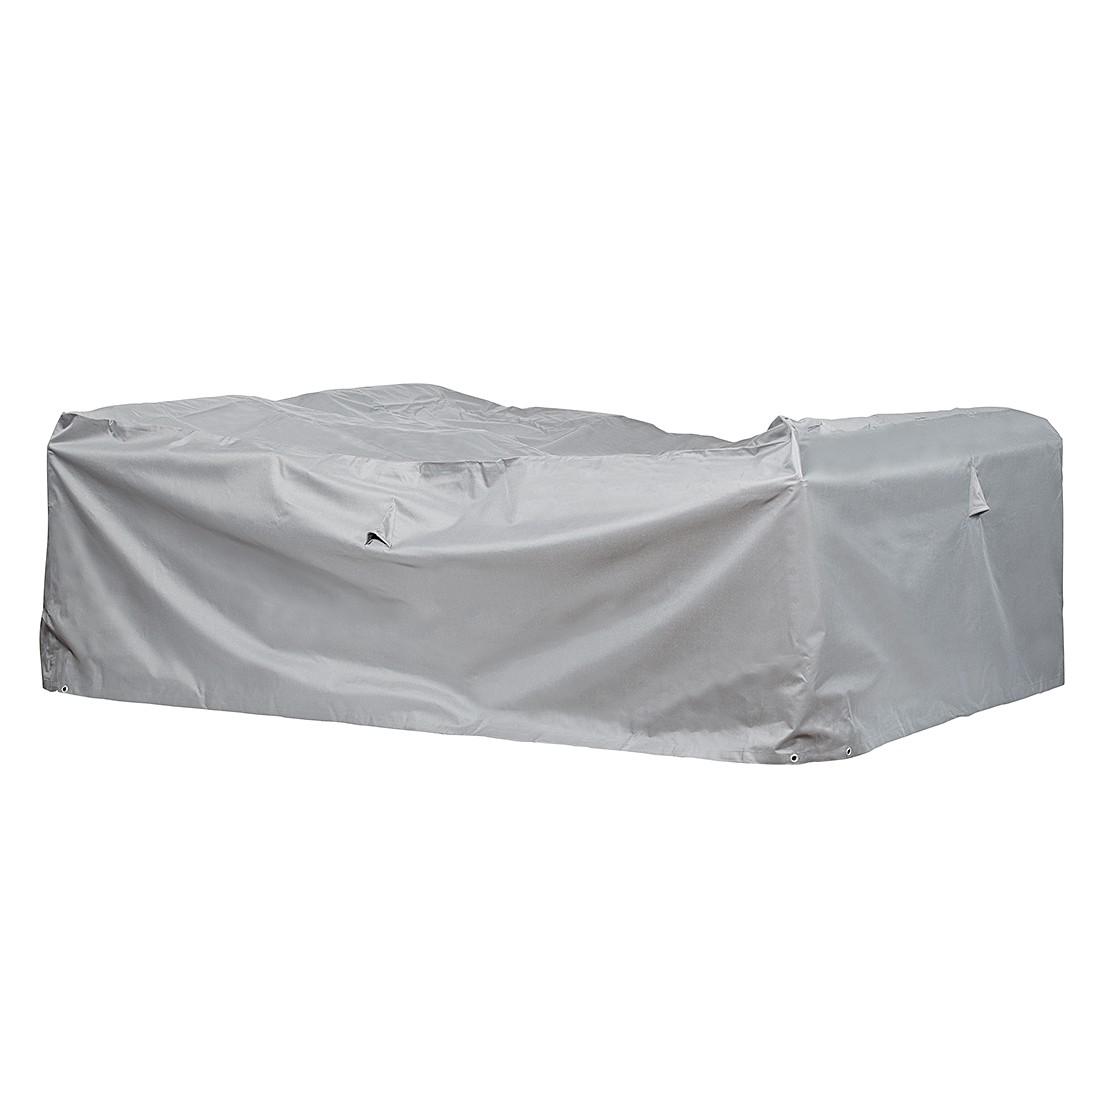 Beschermhoes Premium - voor loungesets (230x165cm) - polyester, mehr Garten